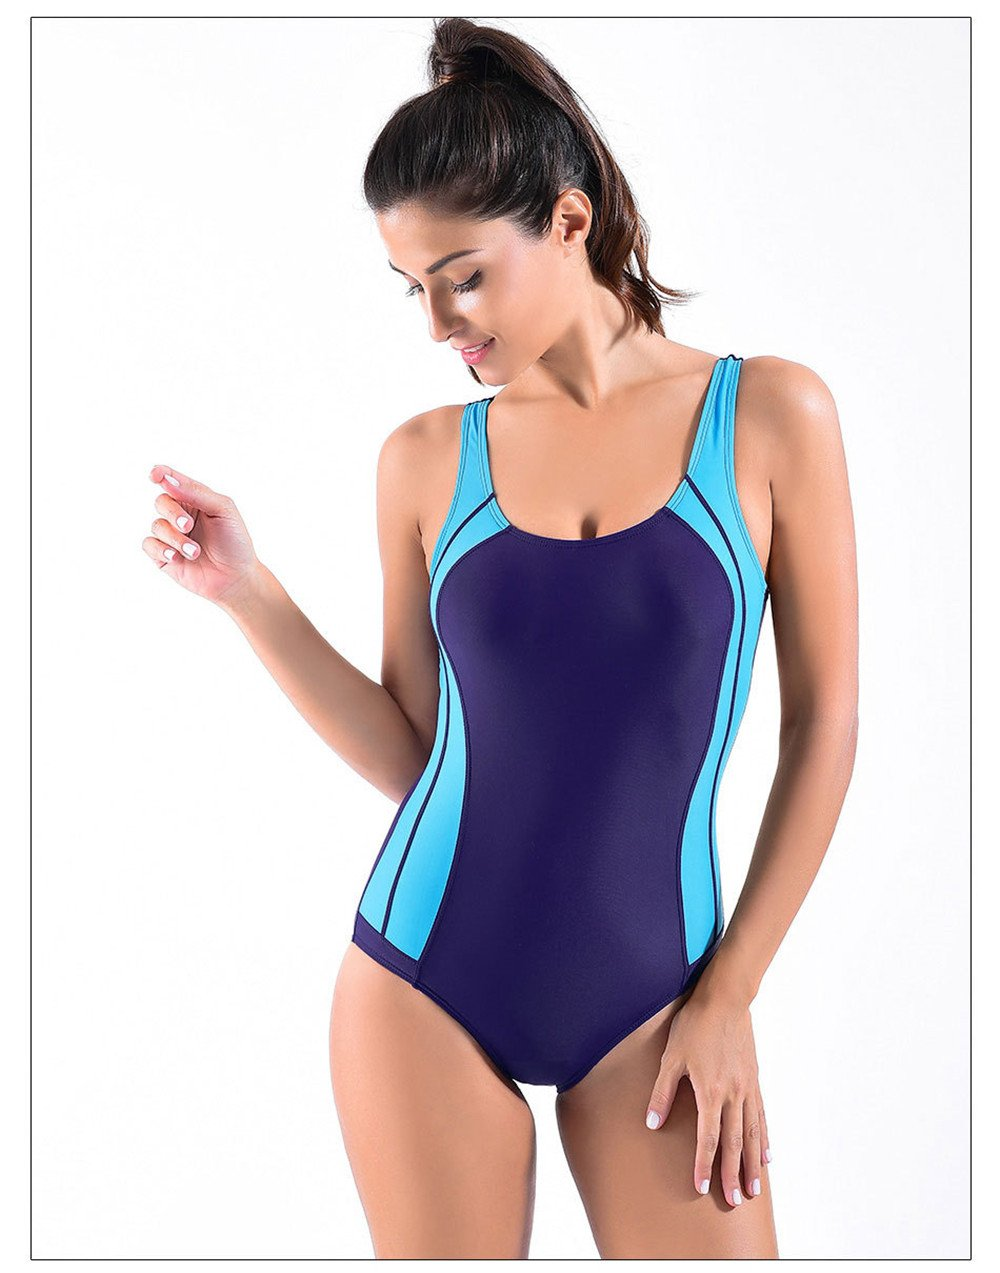 Amadoierly One Piece Badeanzug Sexy Neckholder Bademode Dame B07CW1TRSC Wettkampf-Badeanzüge Gutes Design